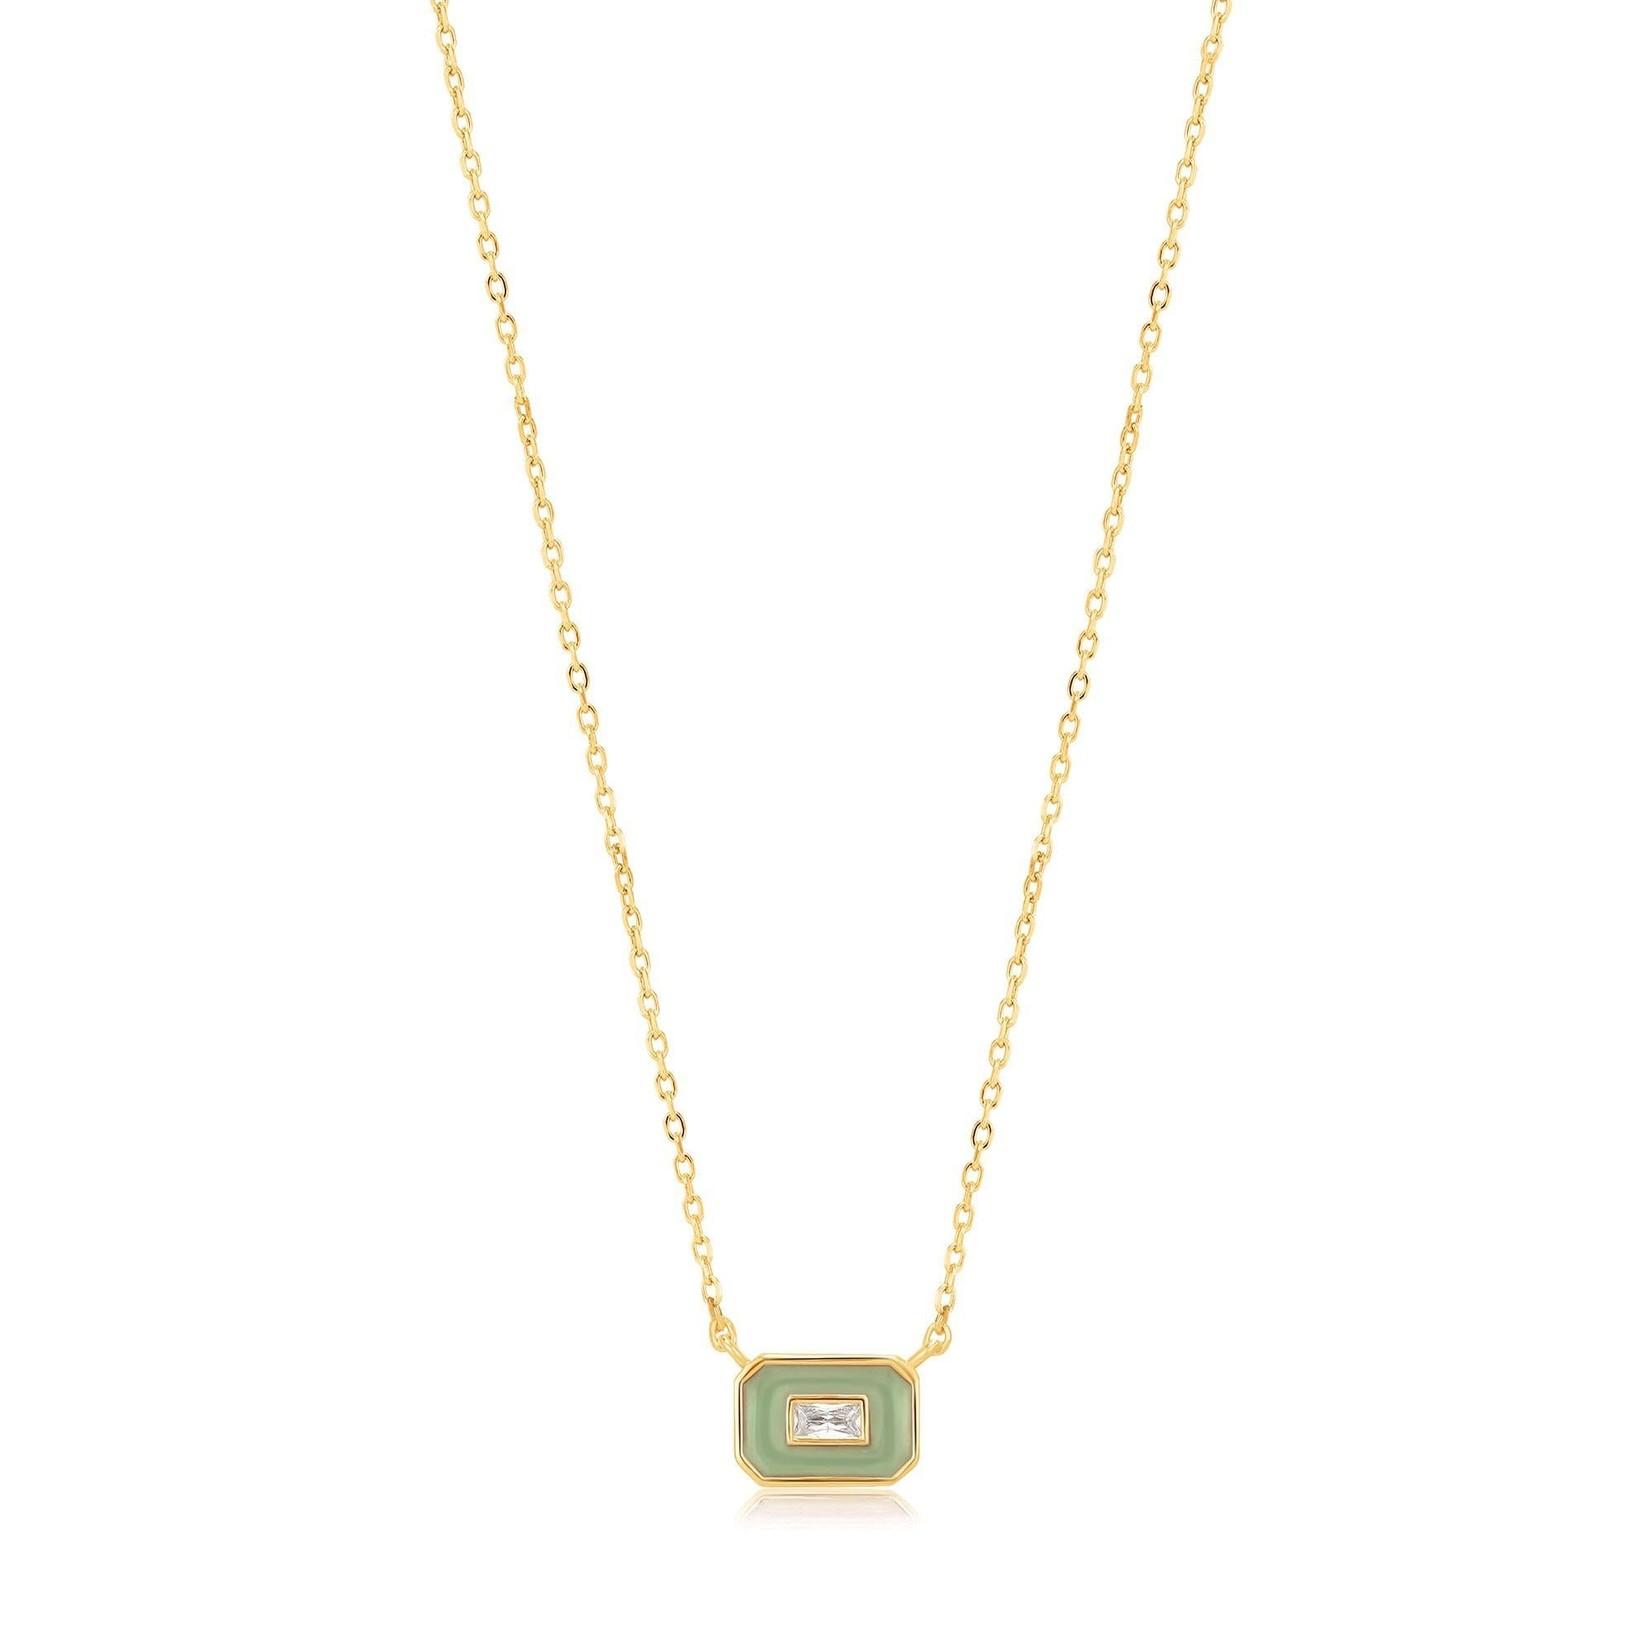 Ania Haie Sage Green Enamel Emblem Necklace